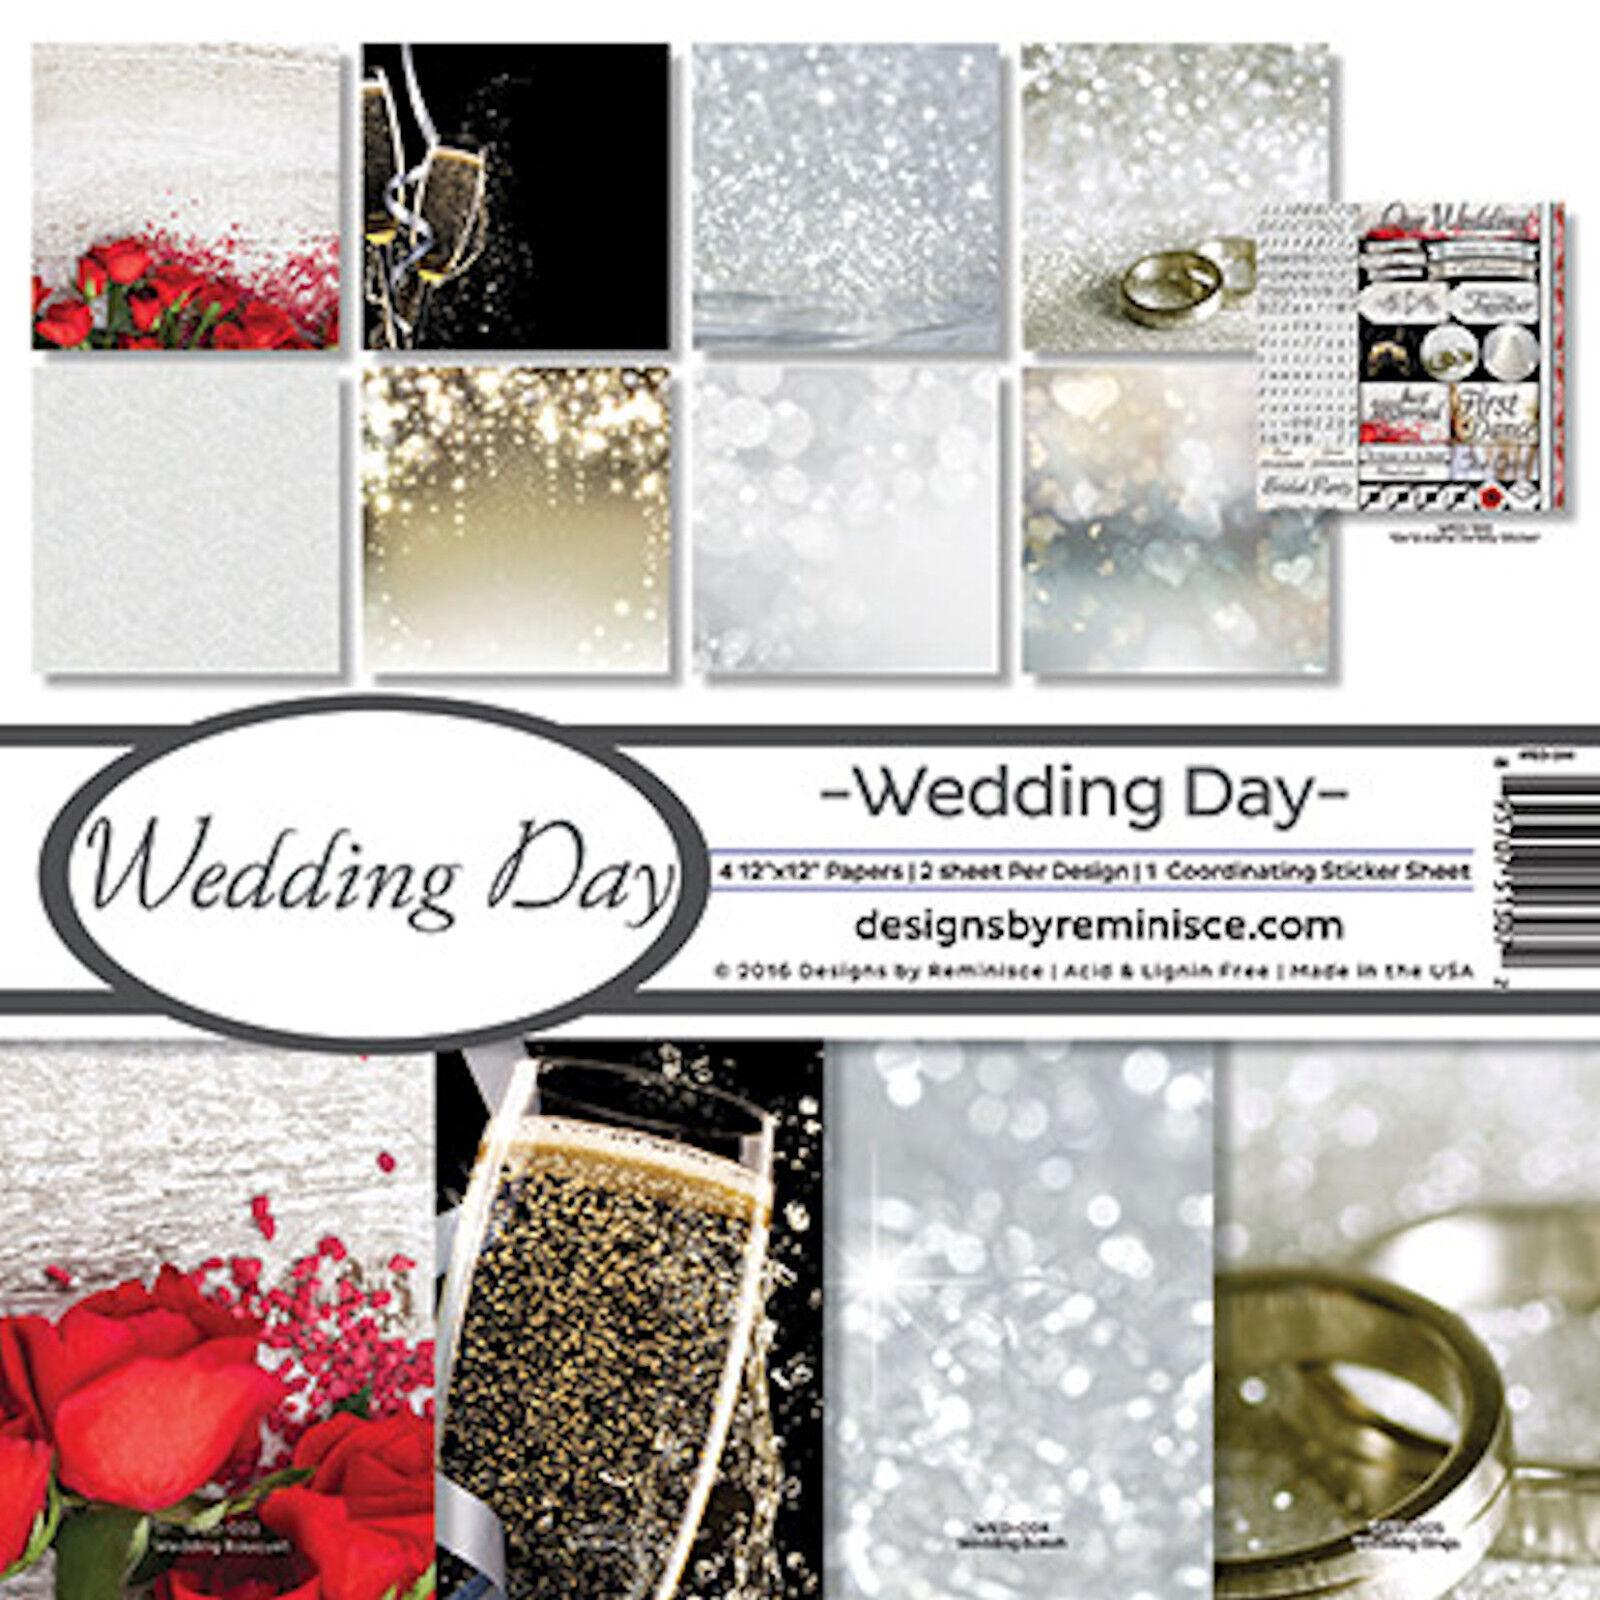 12x12 wedding scrapbook paper - Reminisce Wedding Day Scrapbook Kit 8 12x12 Papers